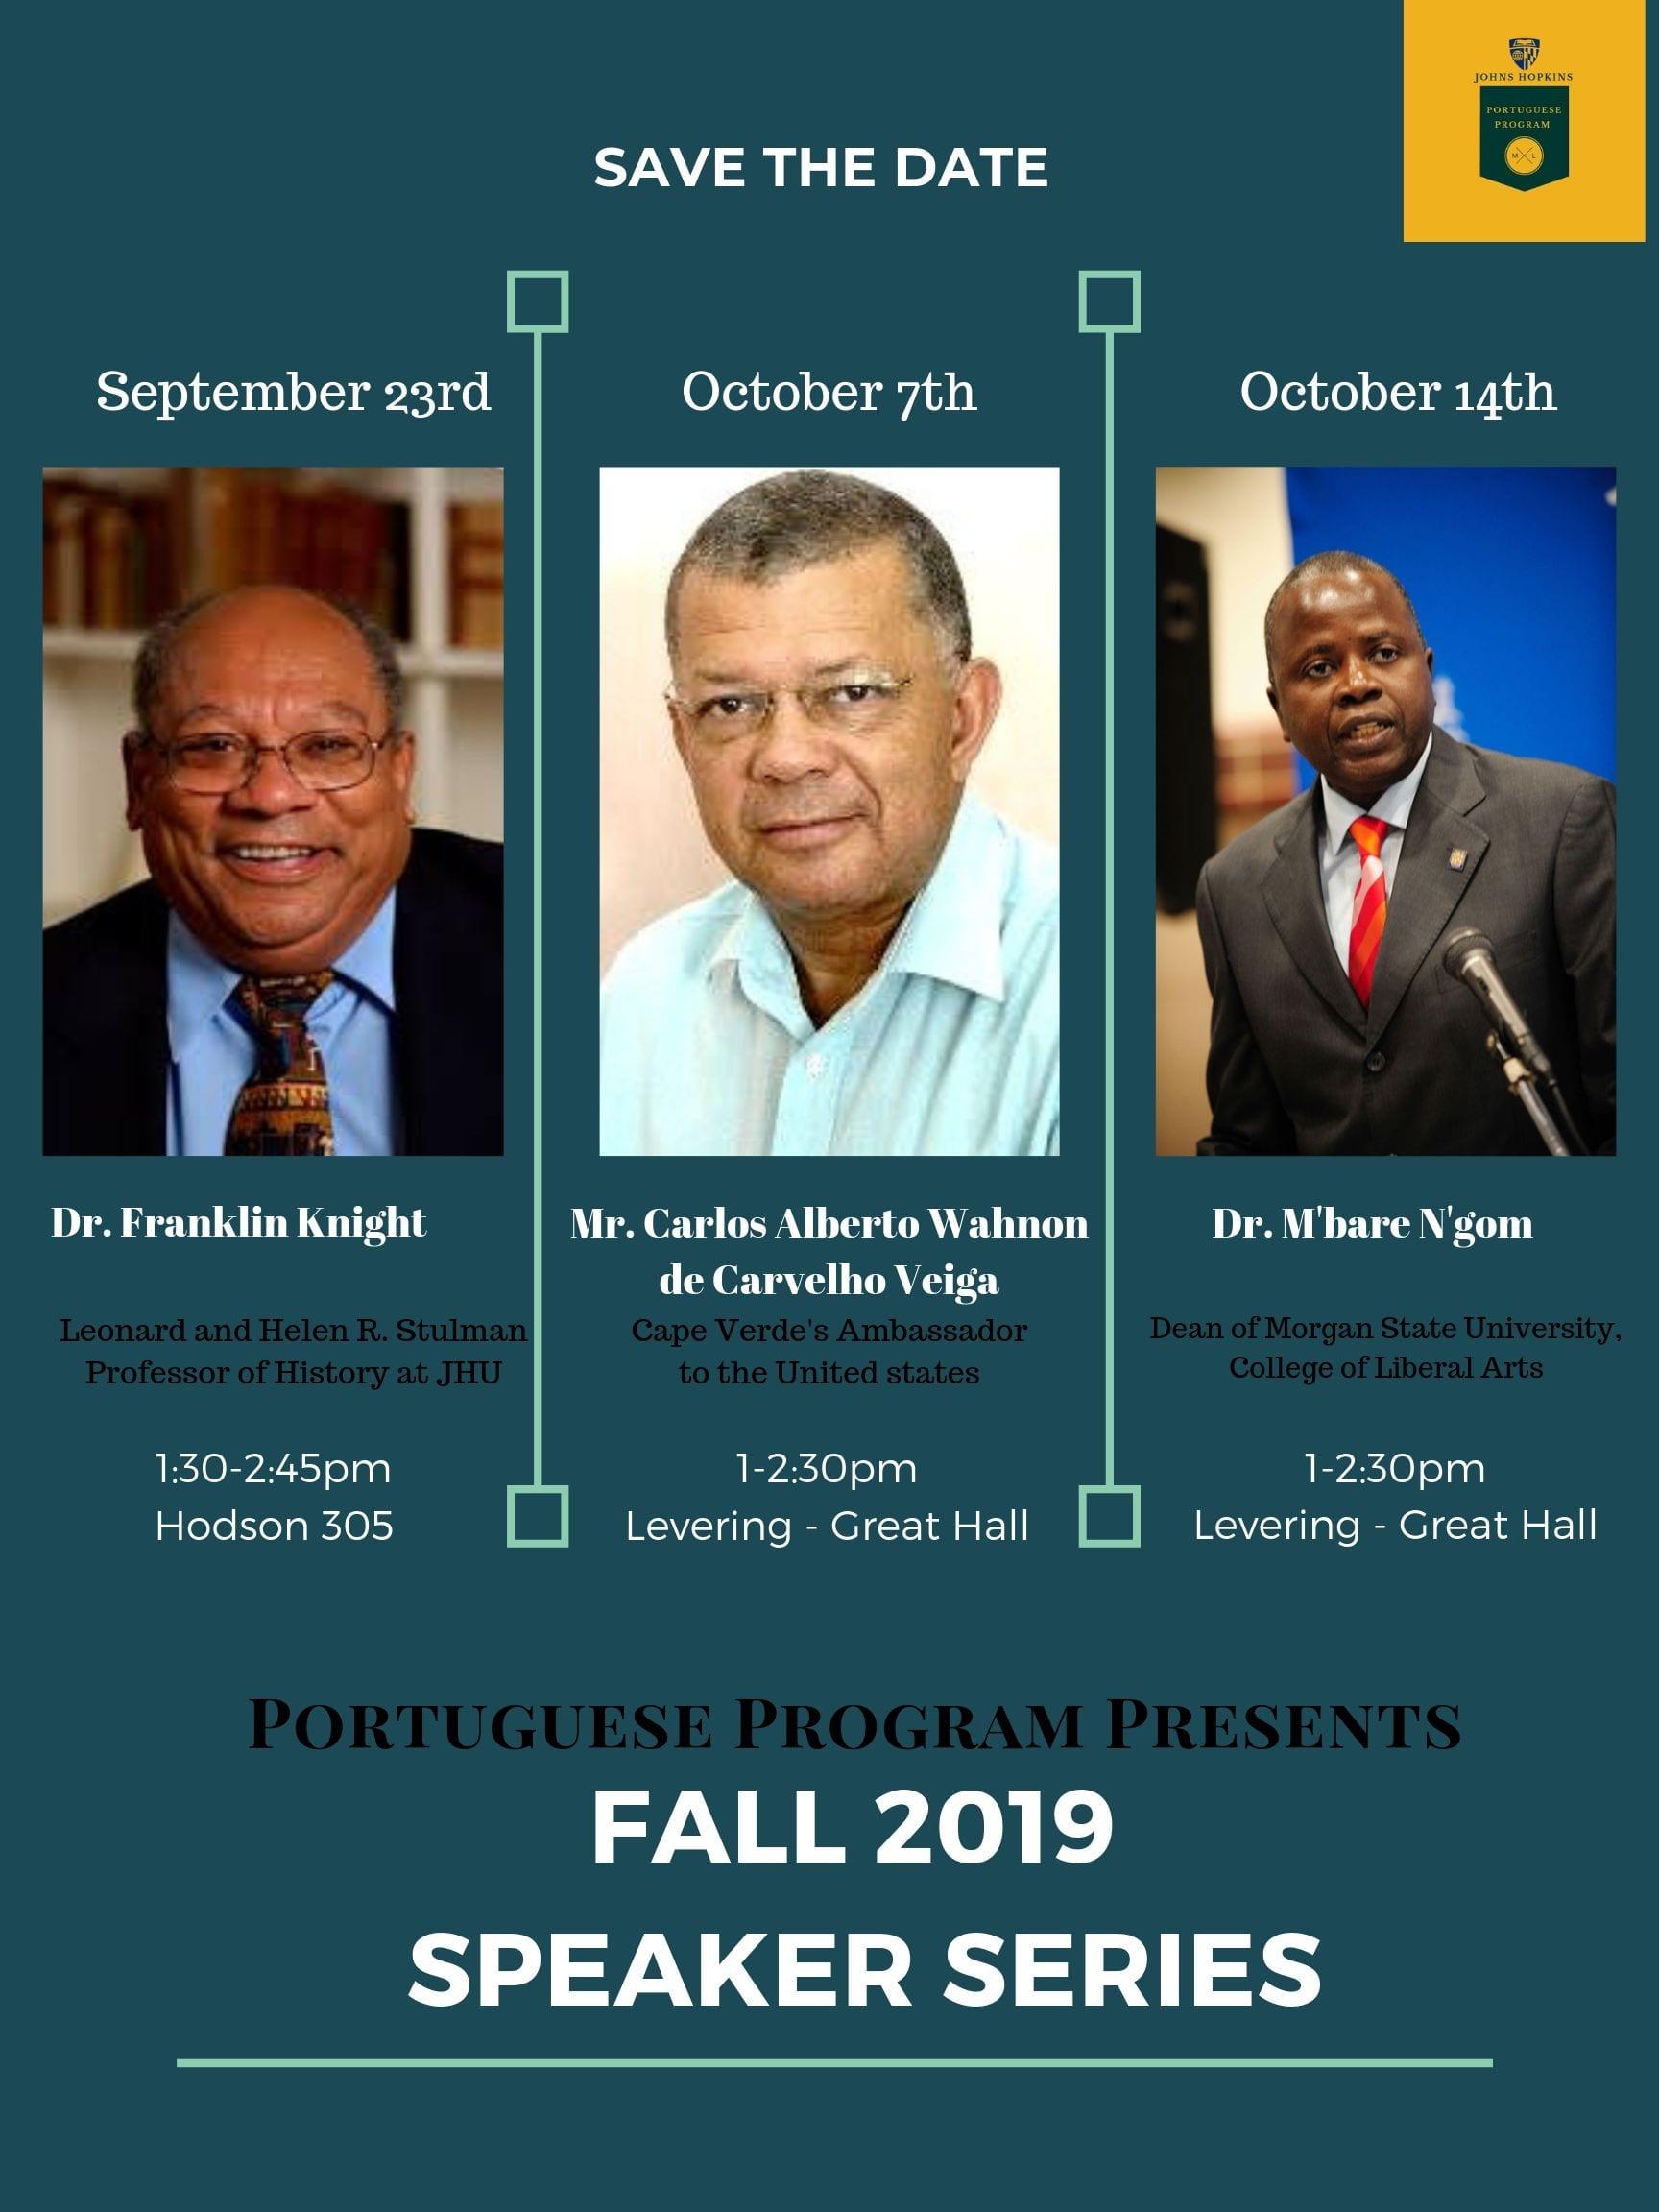 Portuguese Program Fall 2019 Speaker Series Lineup Announced